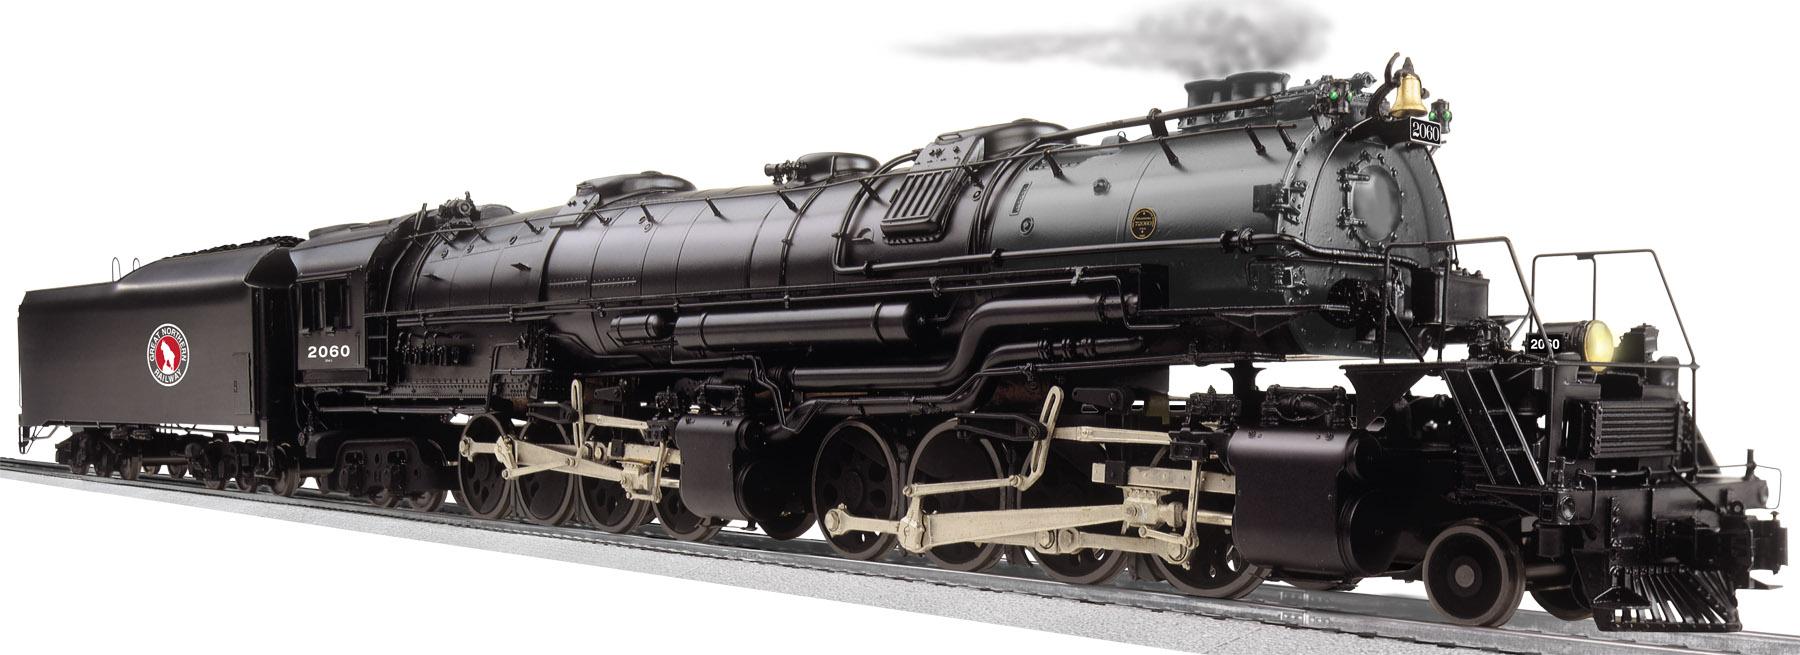 Great Northern LEGACY Scale 2-8-8-4 EM-1 Steam Locomotive #2060